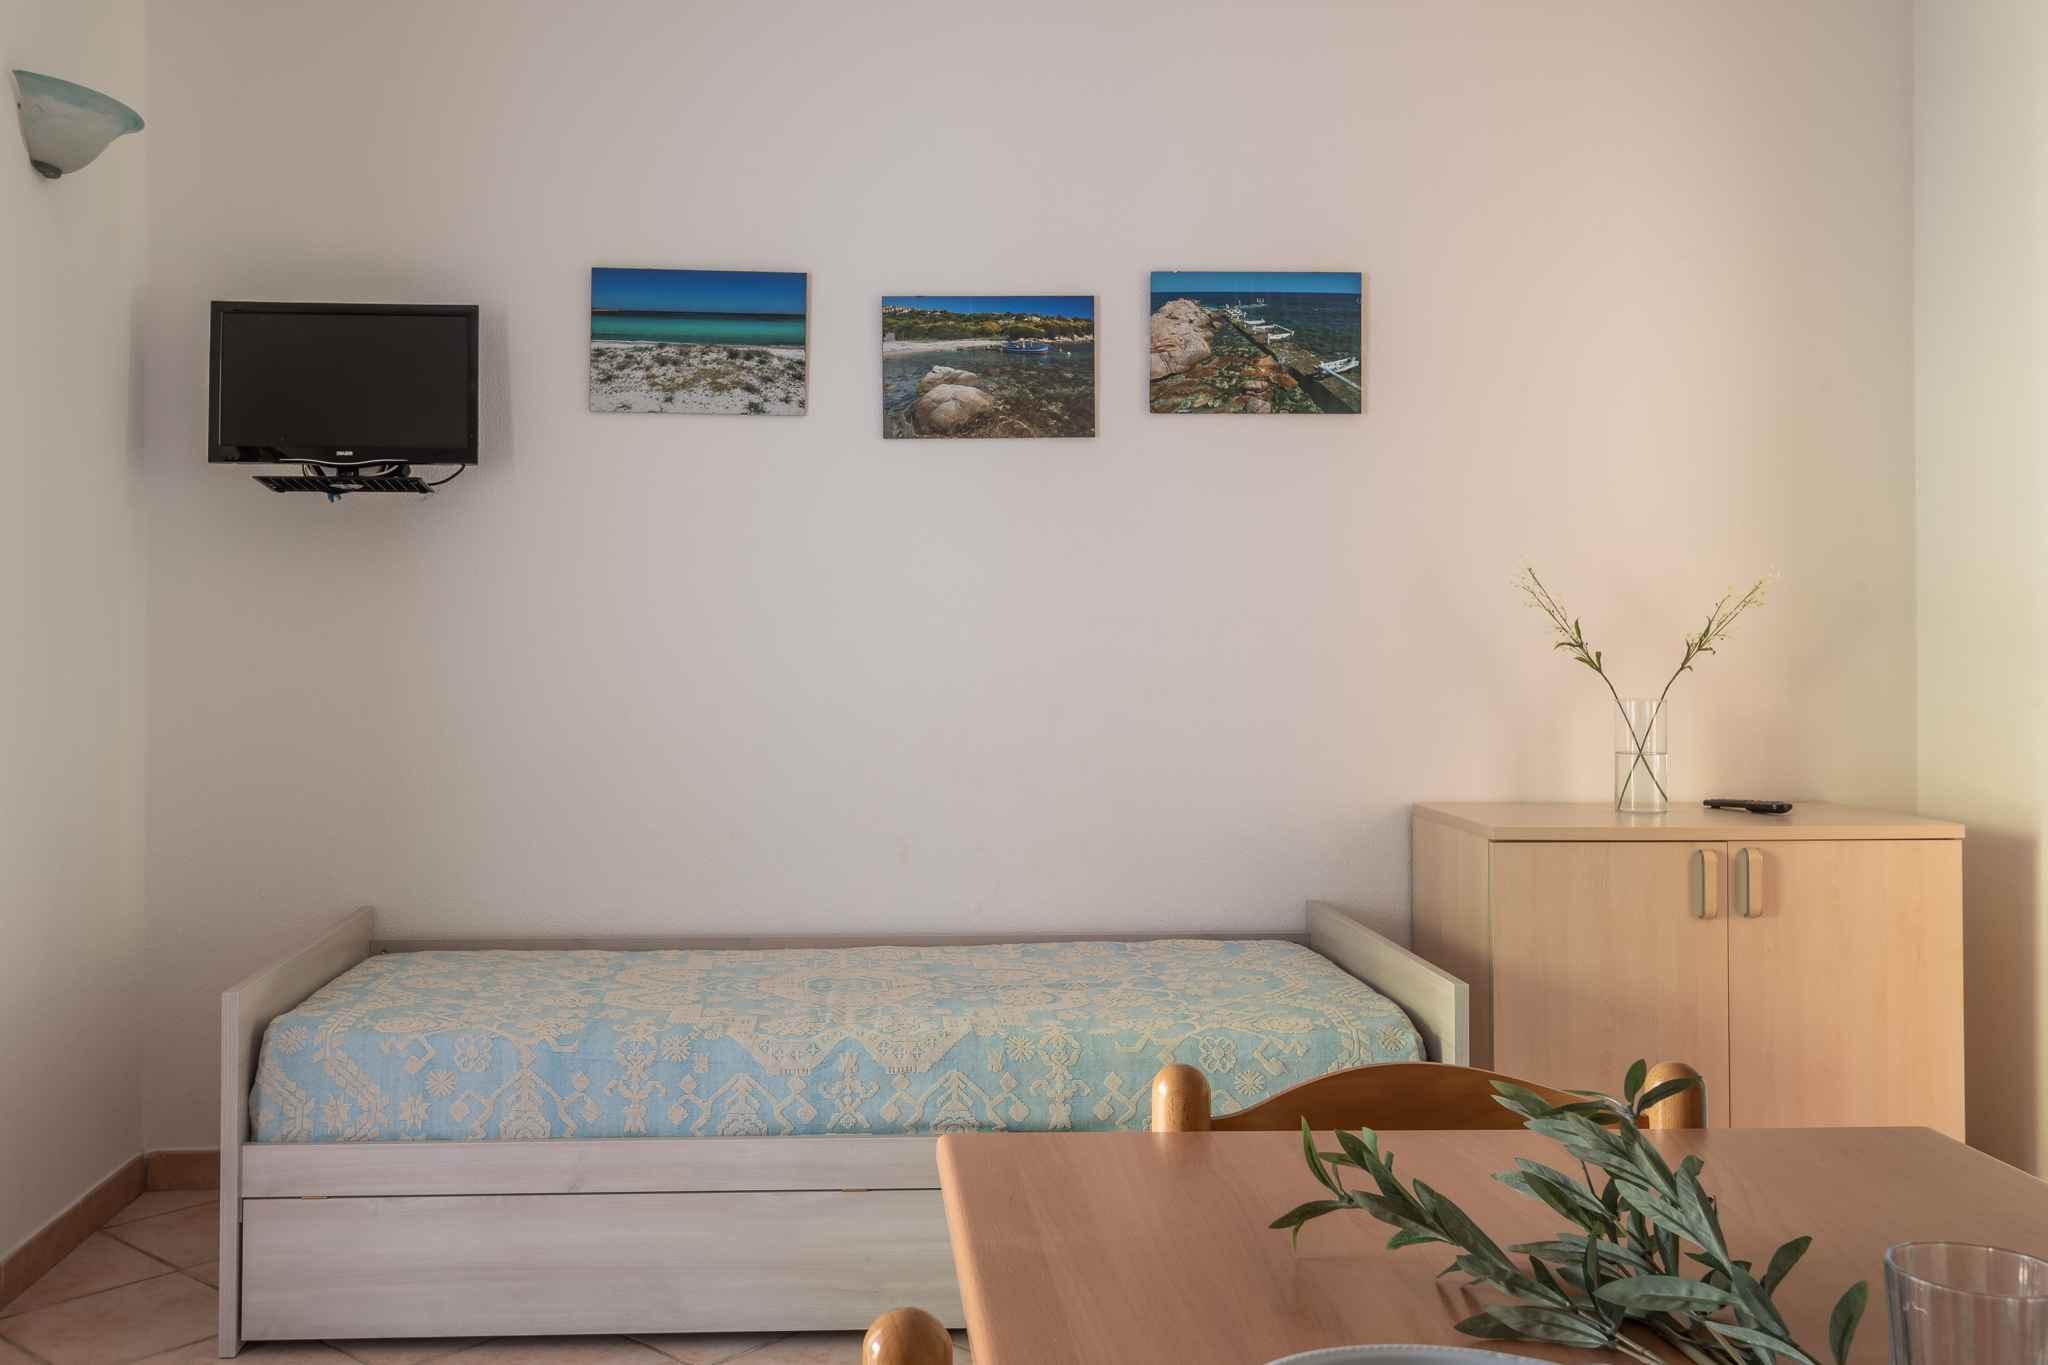 Ferienwohnung Appartamento 4 persone (2853260), Budoni, Olbia-Tempio, Sardinien, Italien, Bild 6